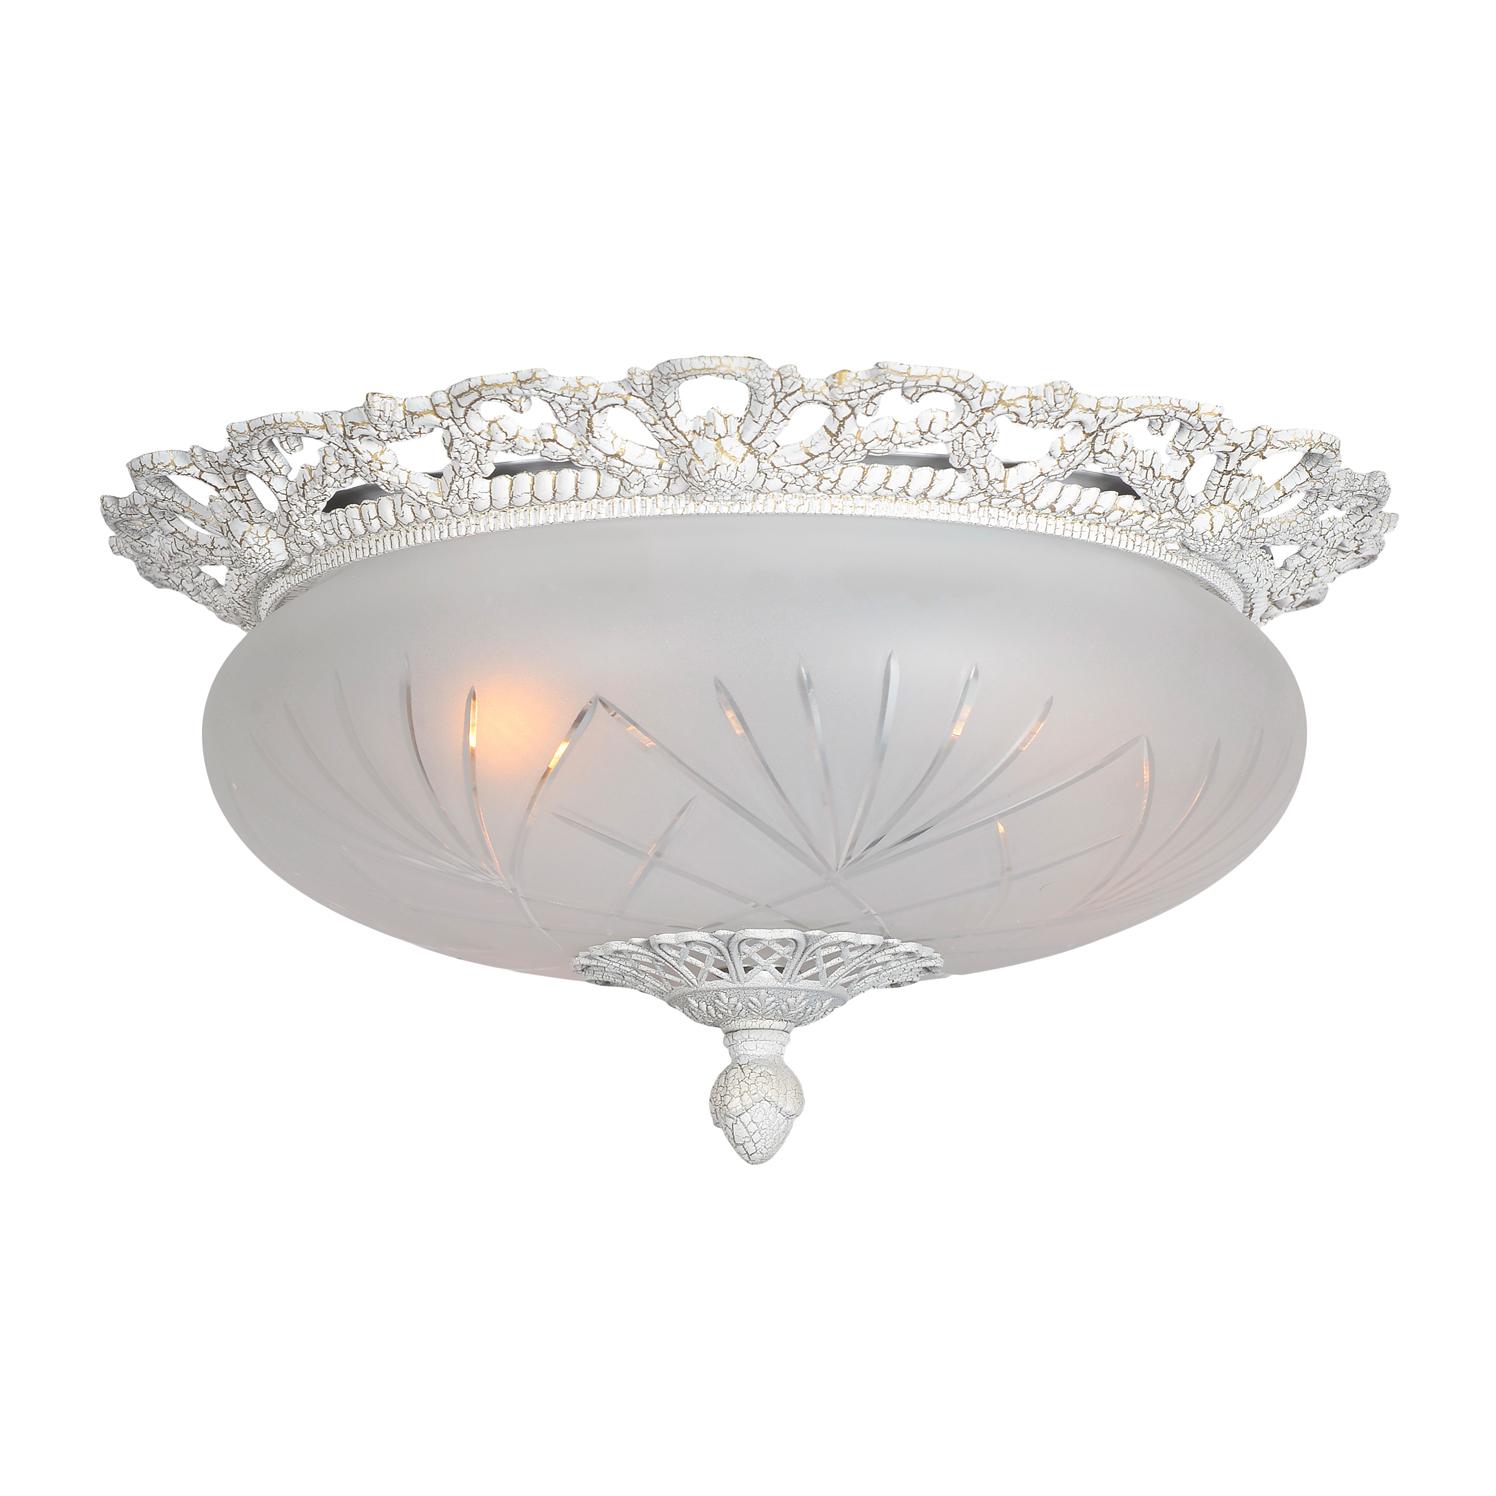 Потолочные светильники Venezia E 1.13.38 BW Venezia BW Arti Lampadari